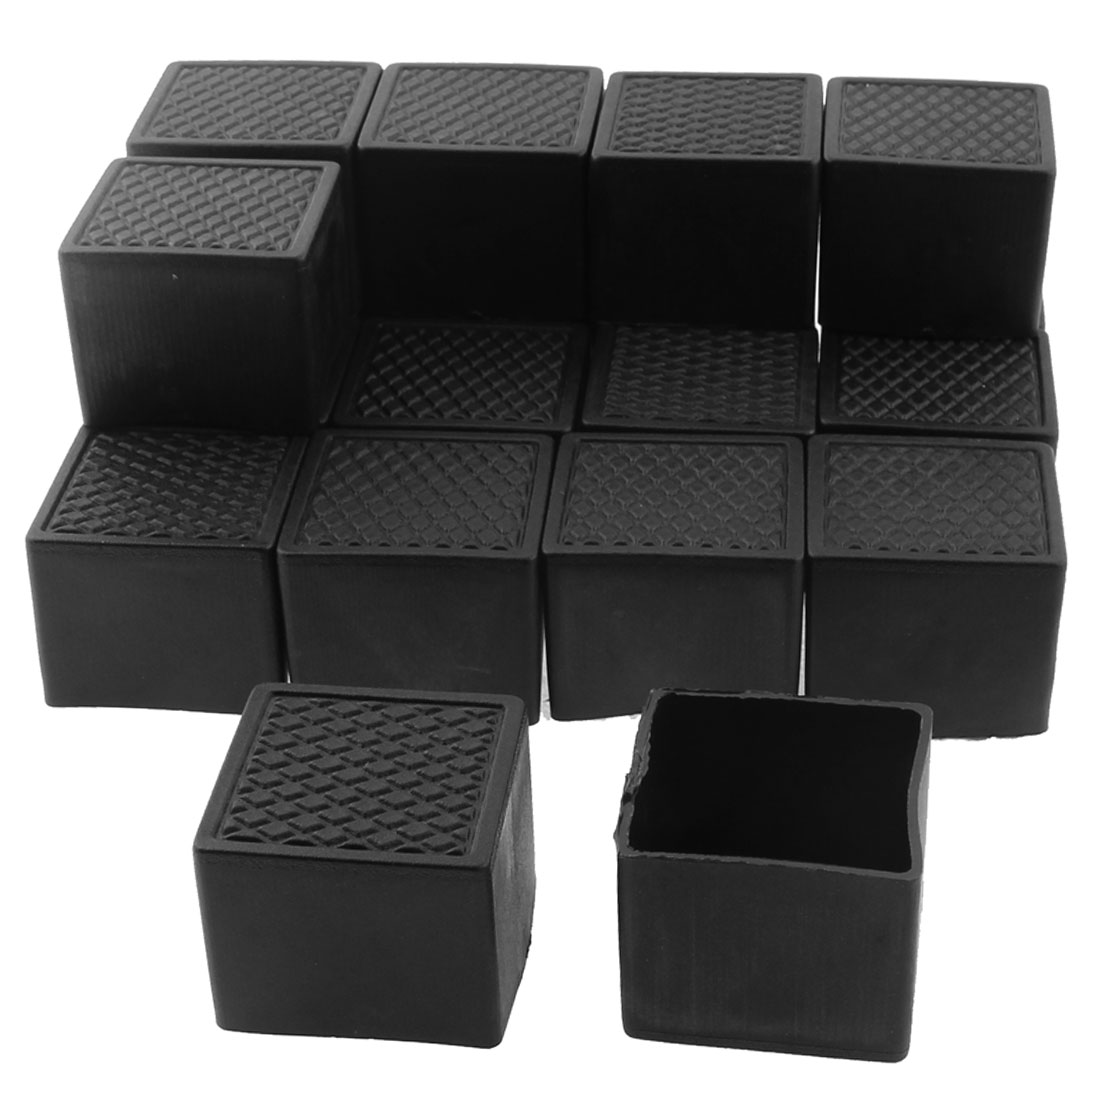 35mm x 35mm Square Shaped Furniture Table Chair Leg Foot Plastic Cover Cap Black 20pcs